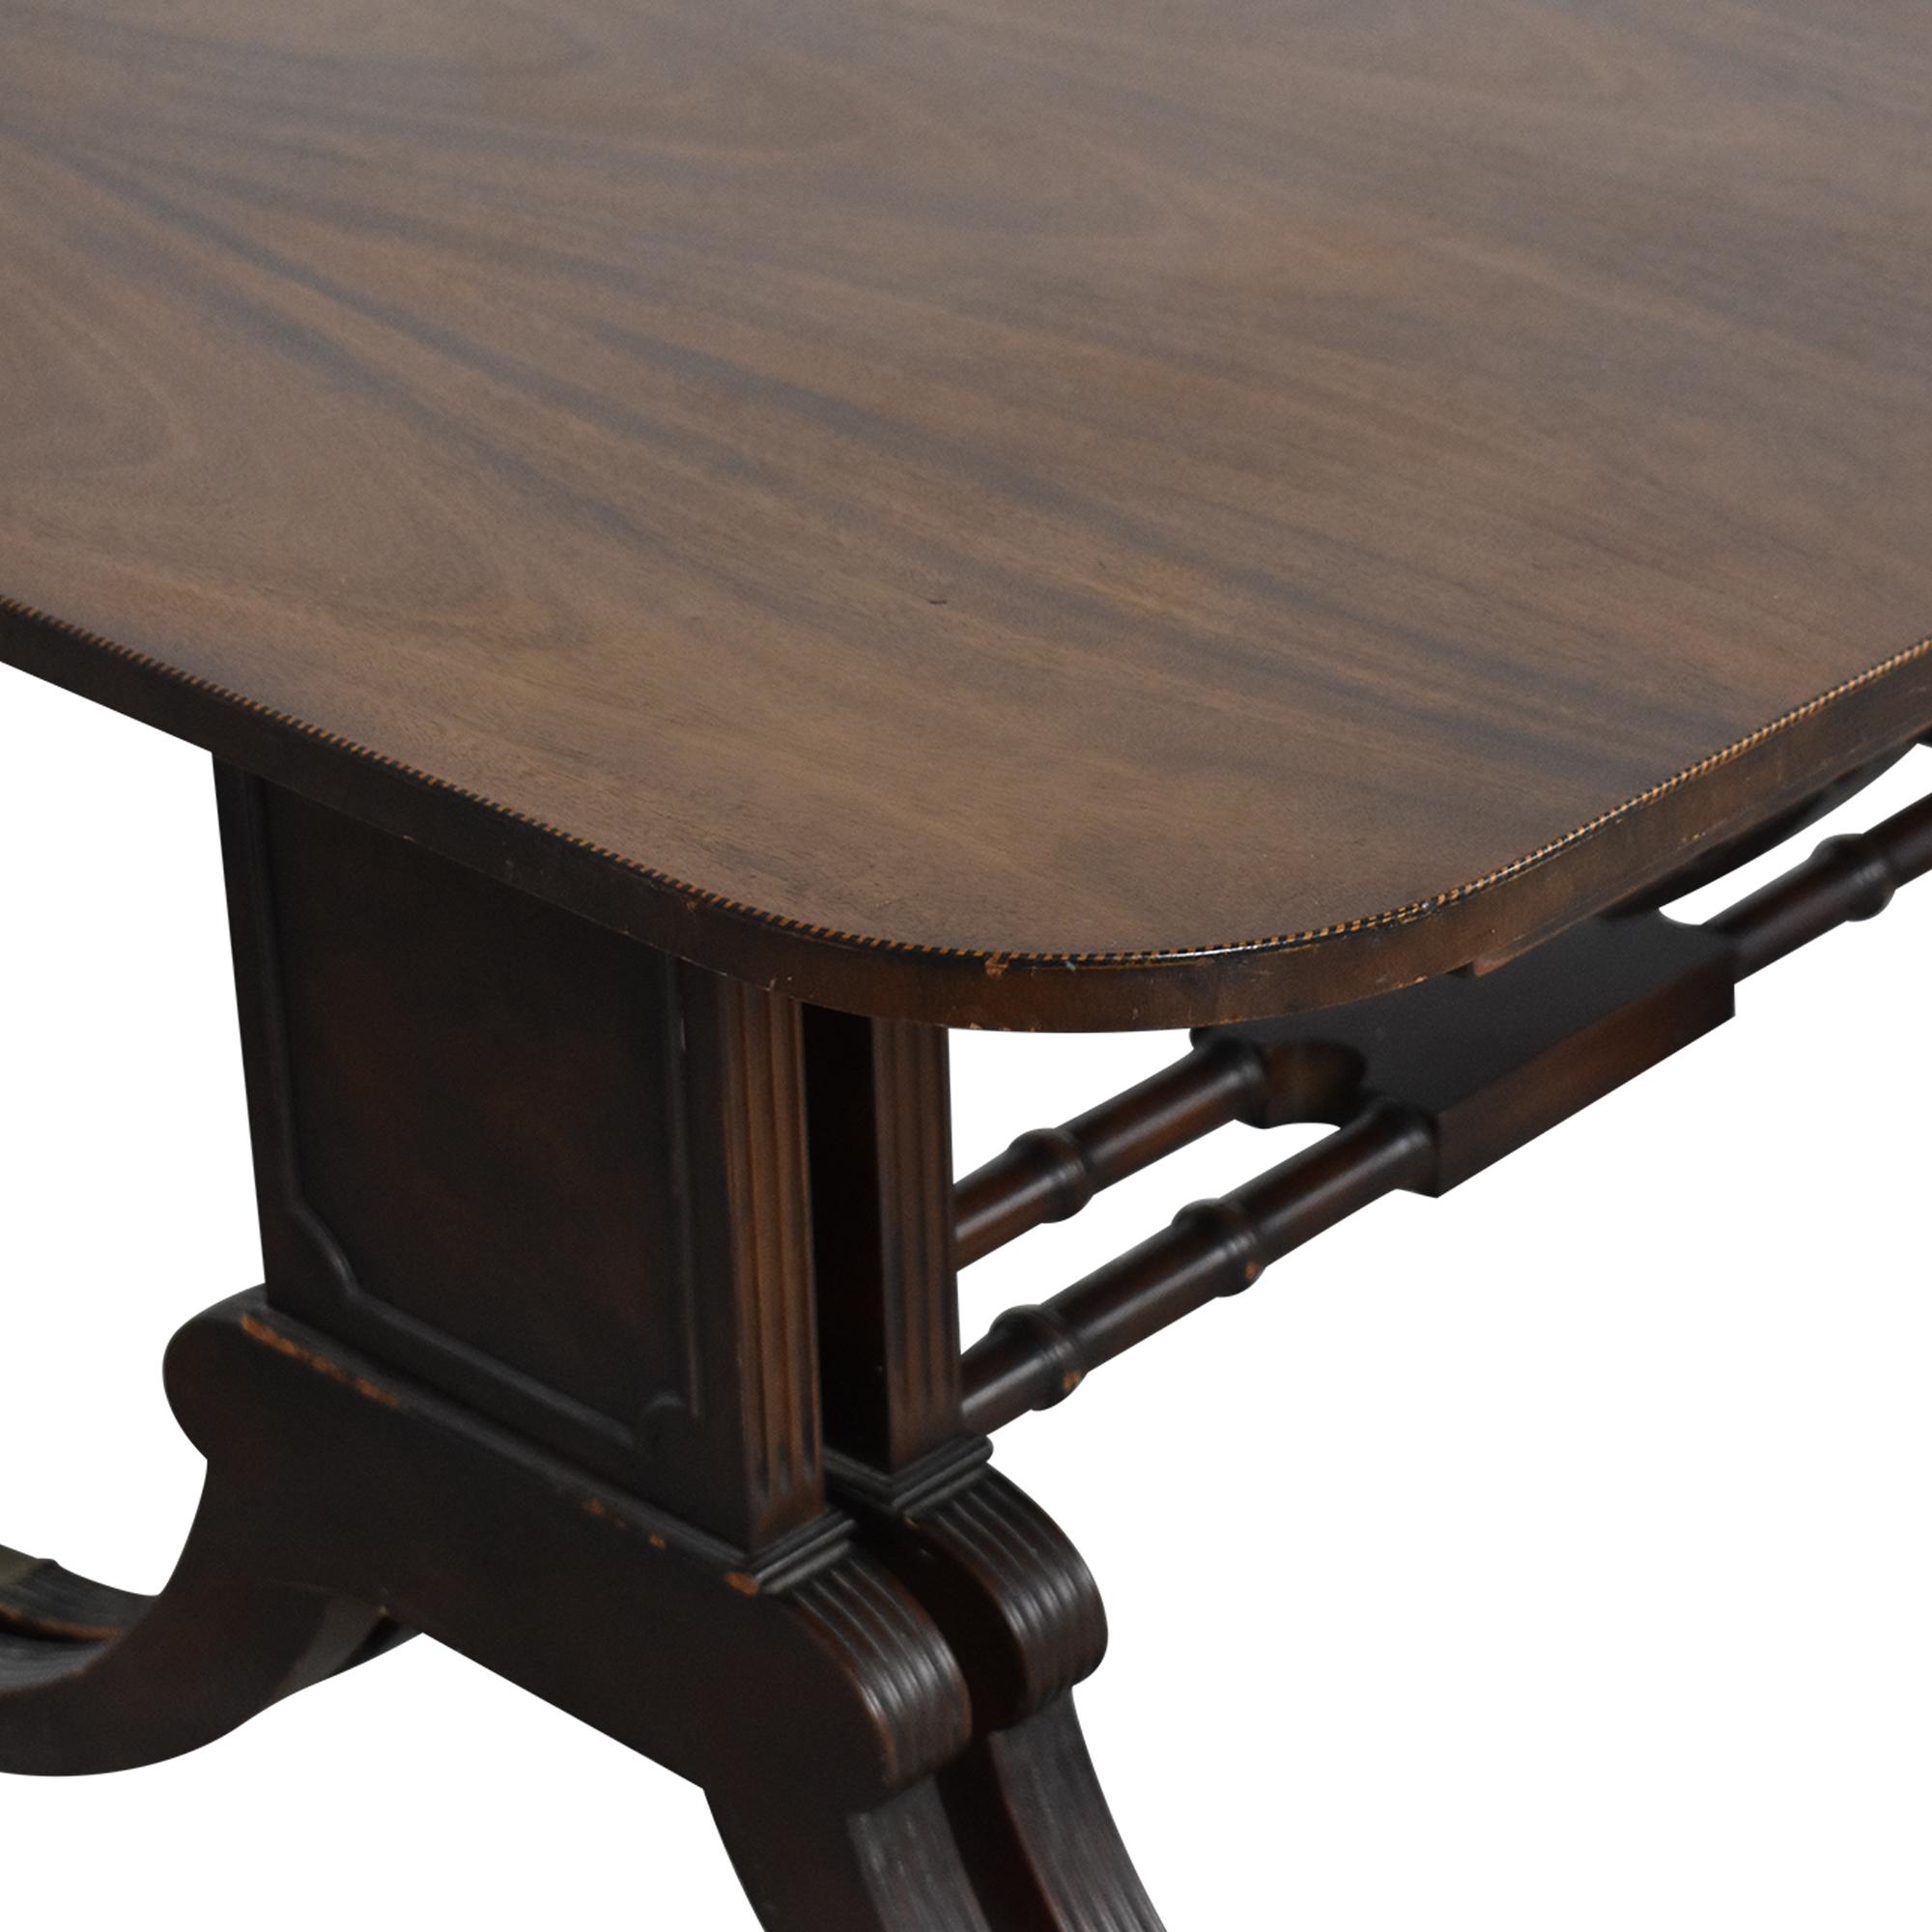 shop Irwin Irwin Vintage Dining Table online